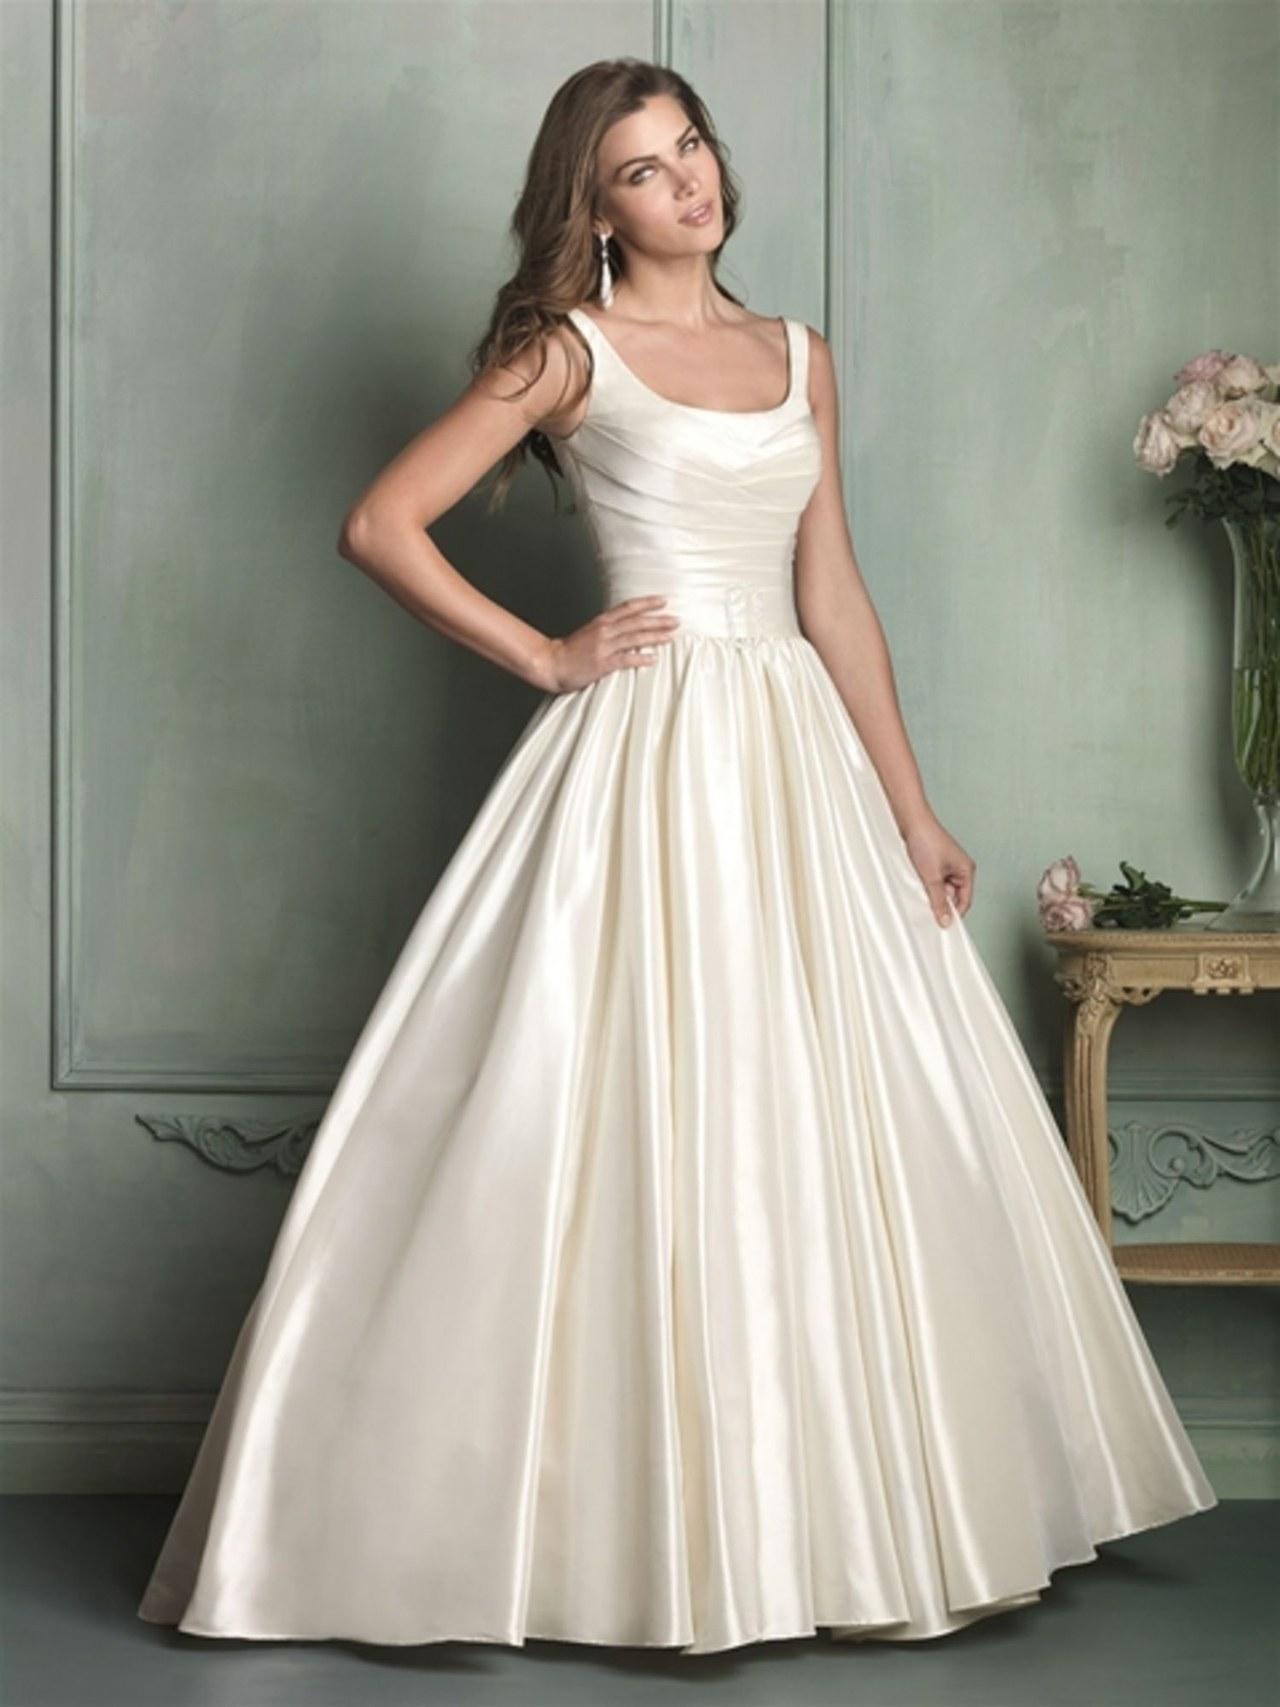 angelina wedding dresses photo - 1